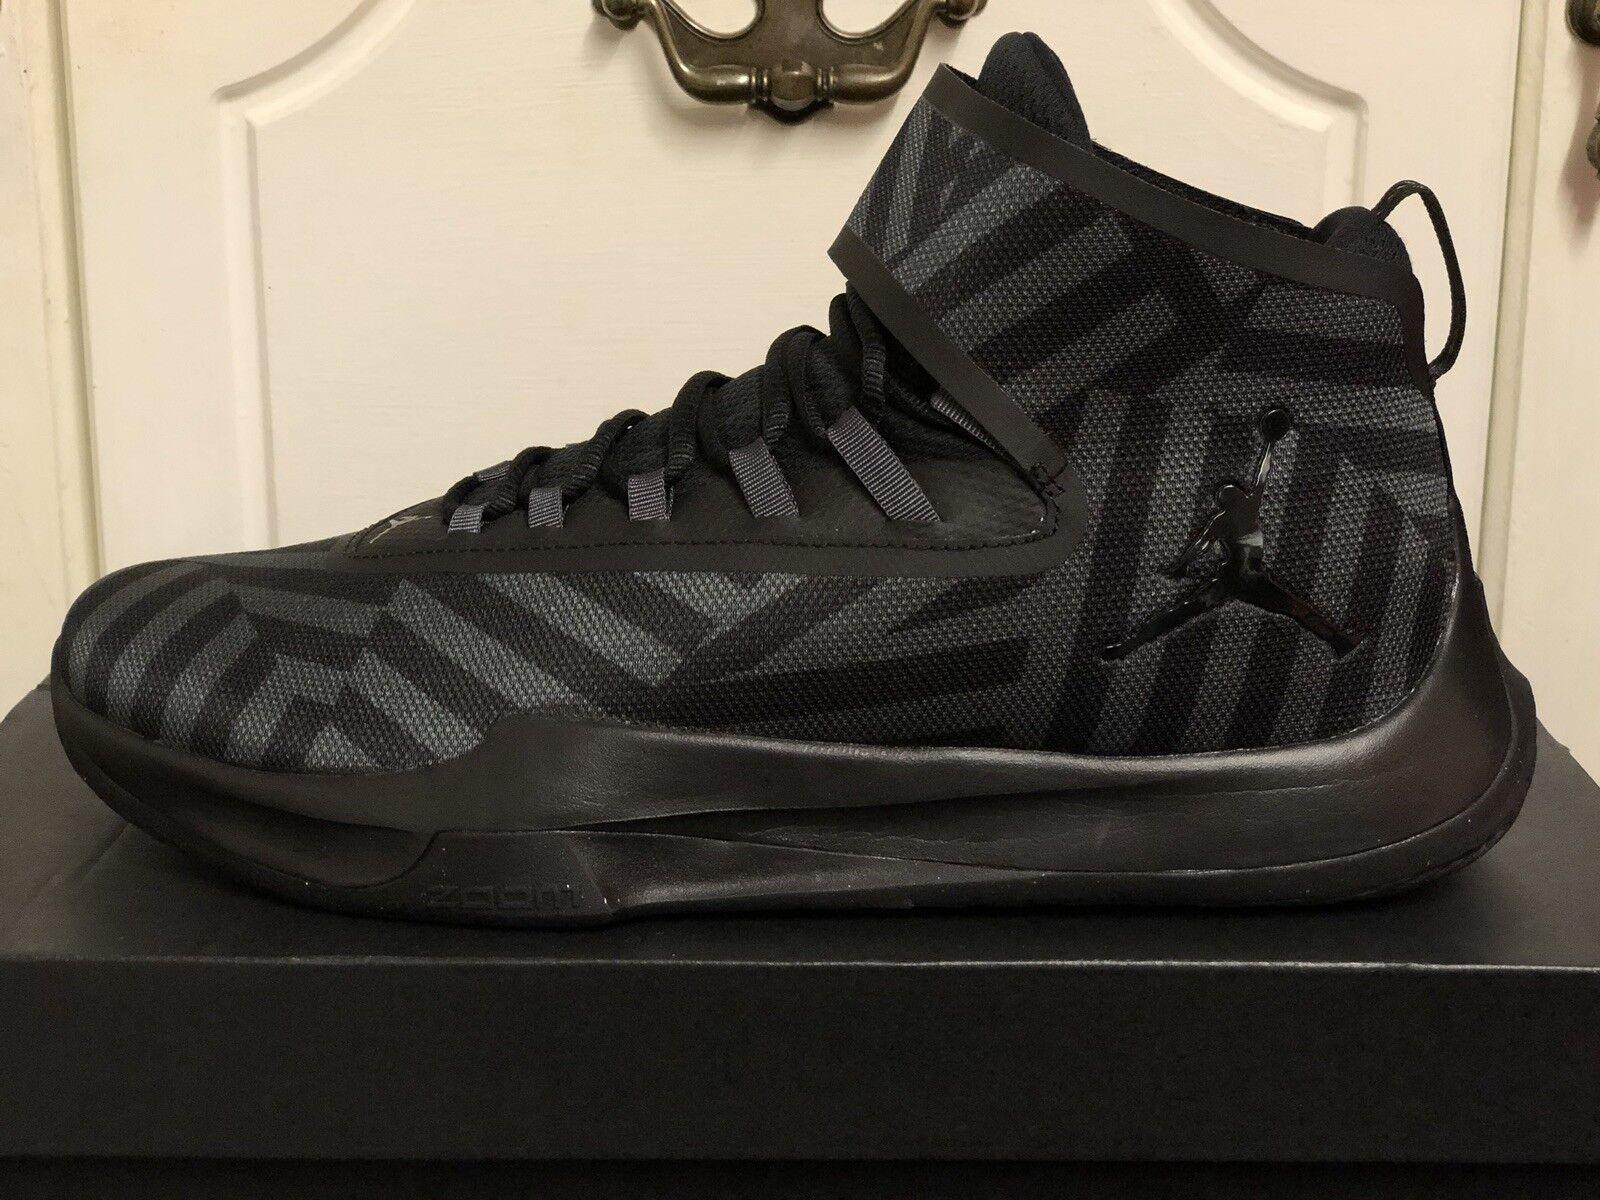 Air Jordan Fly Unlimited Baskets Homme Baskets Chaussures UK 9 EUR 44 US 10